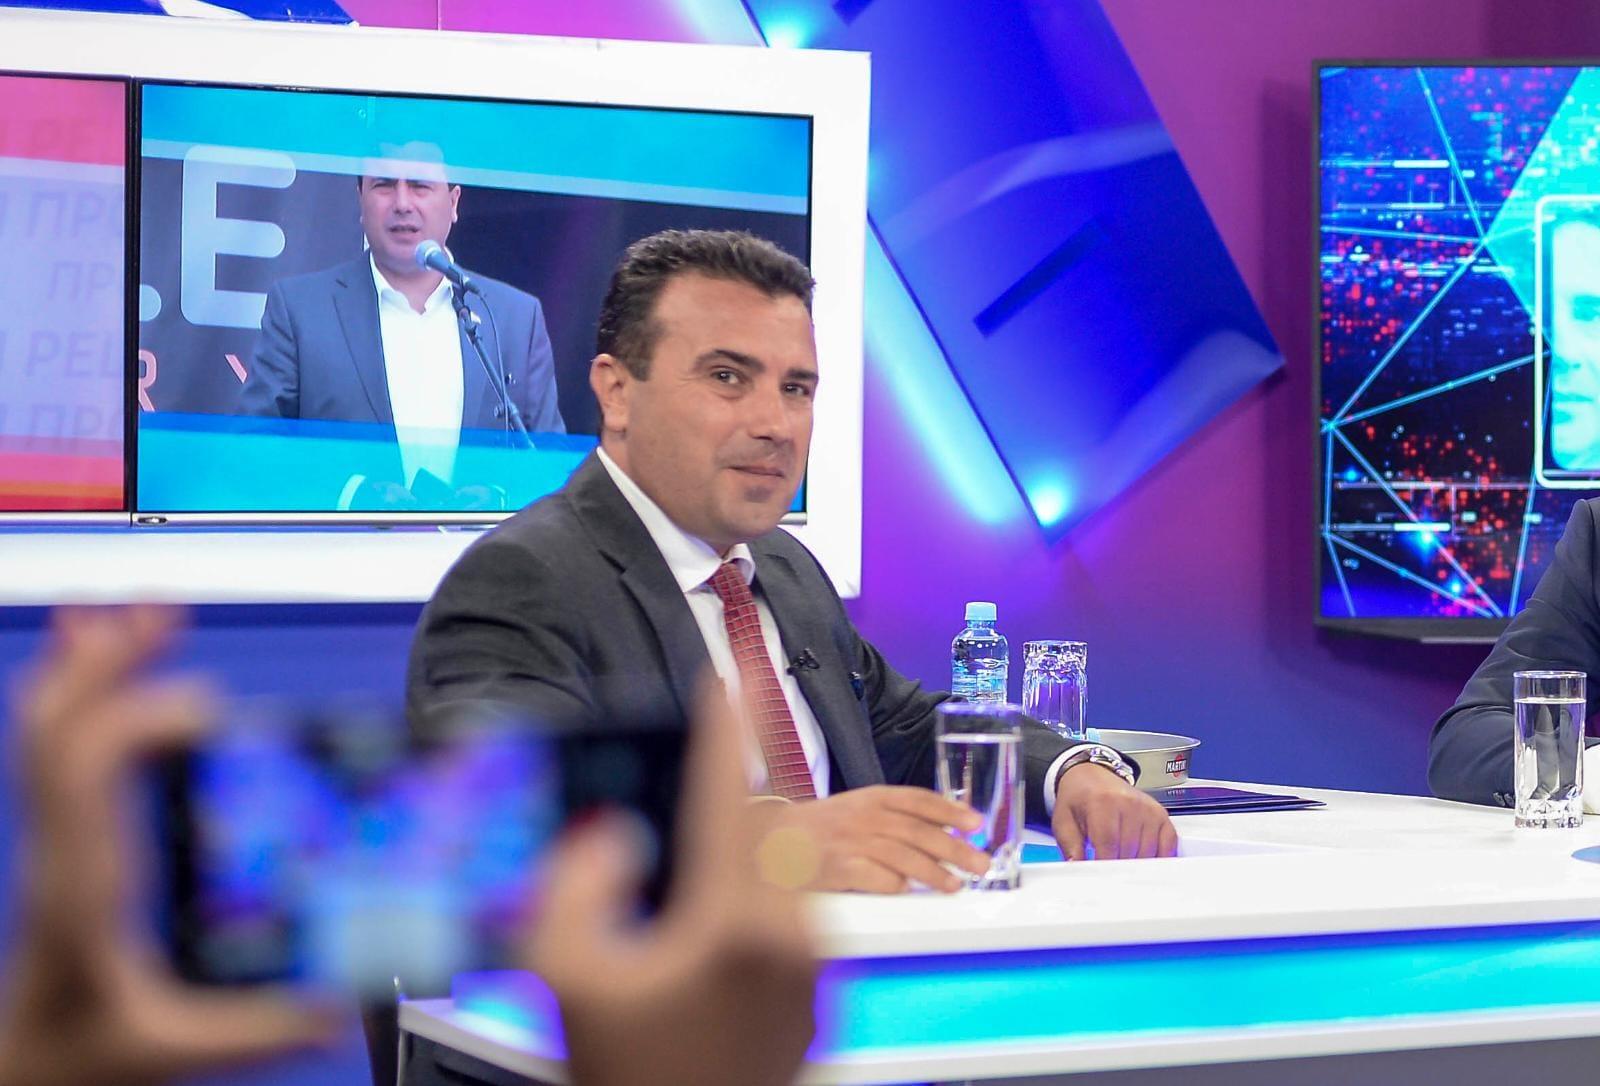 Zaev: Συνεχίζουμε να οικοδομούμε φιλικές σχέσεις με τη Βουλγαρία, η μακεδονική γλώσσα και η ταυτότητα δεν είναι διαπραγματεύσιμες